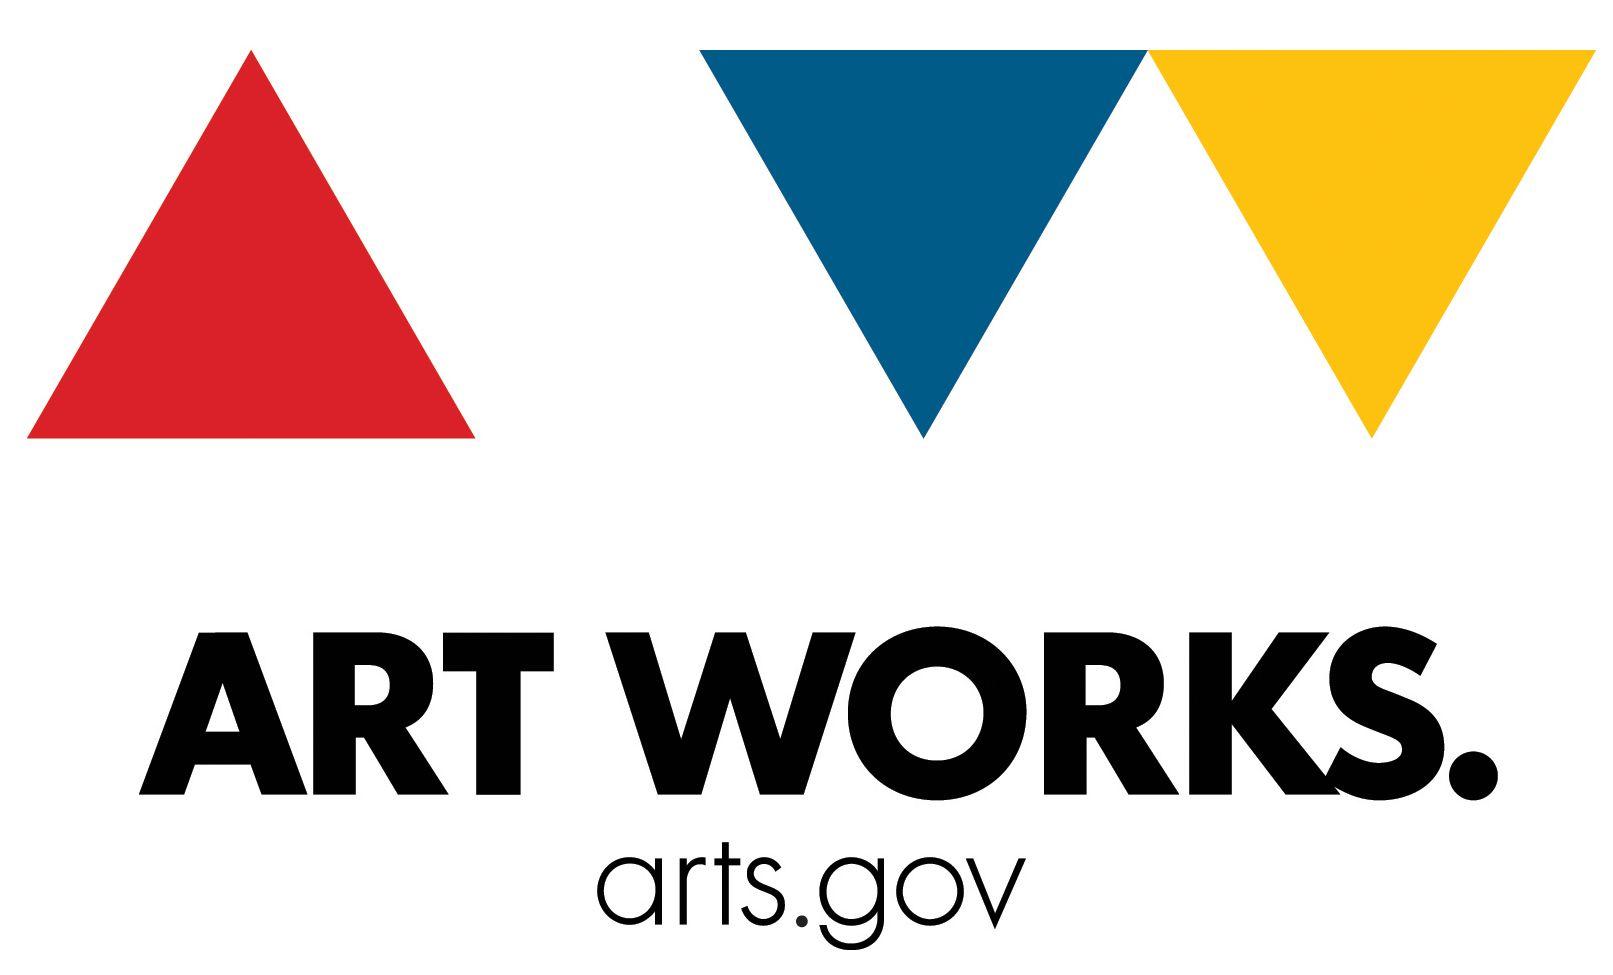 NEA_Art_Works_logo-color.jpg